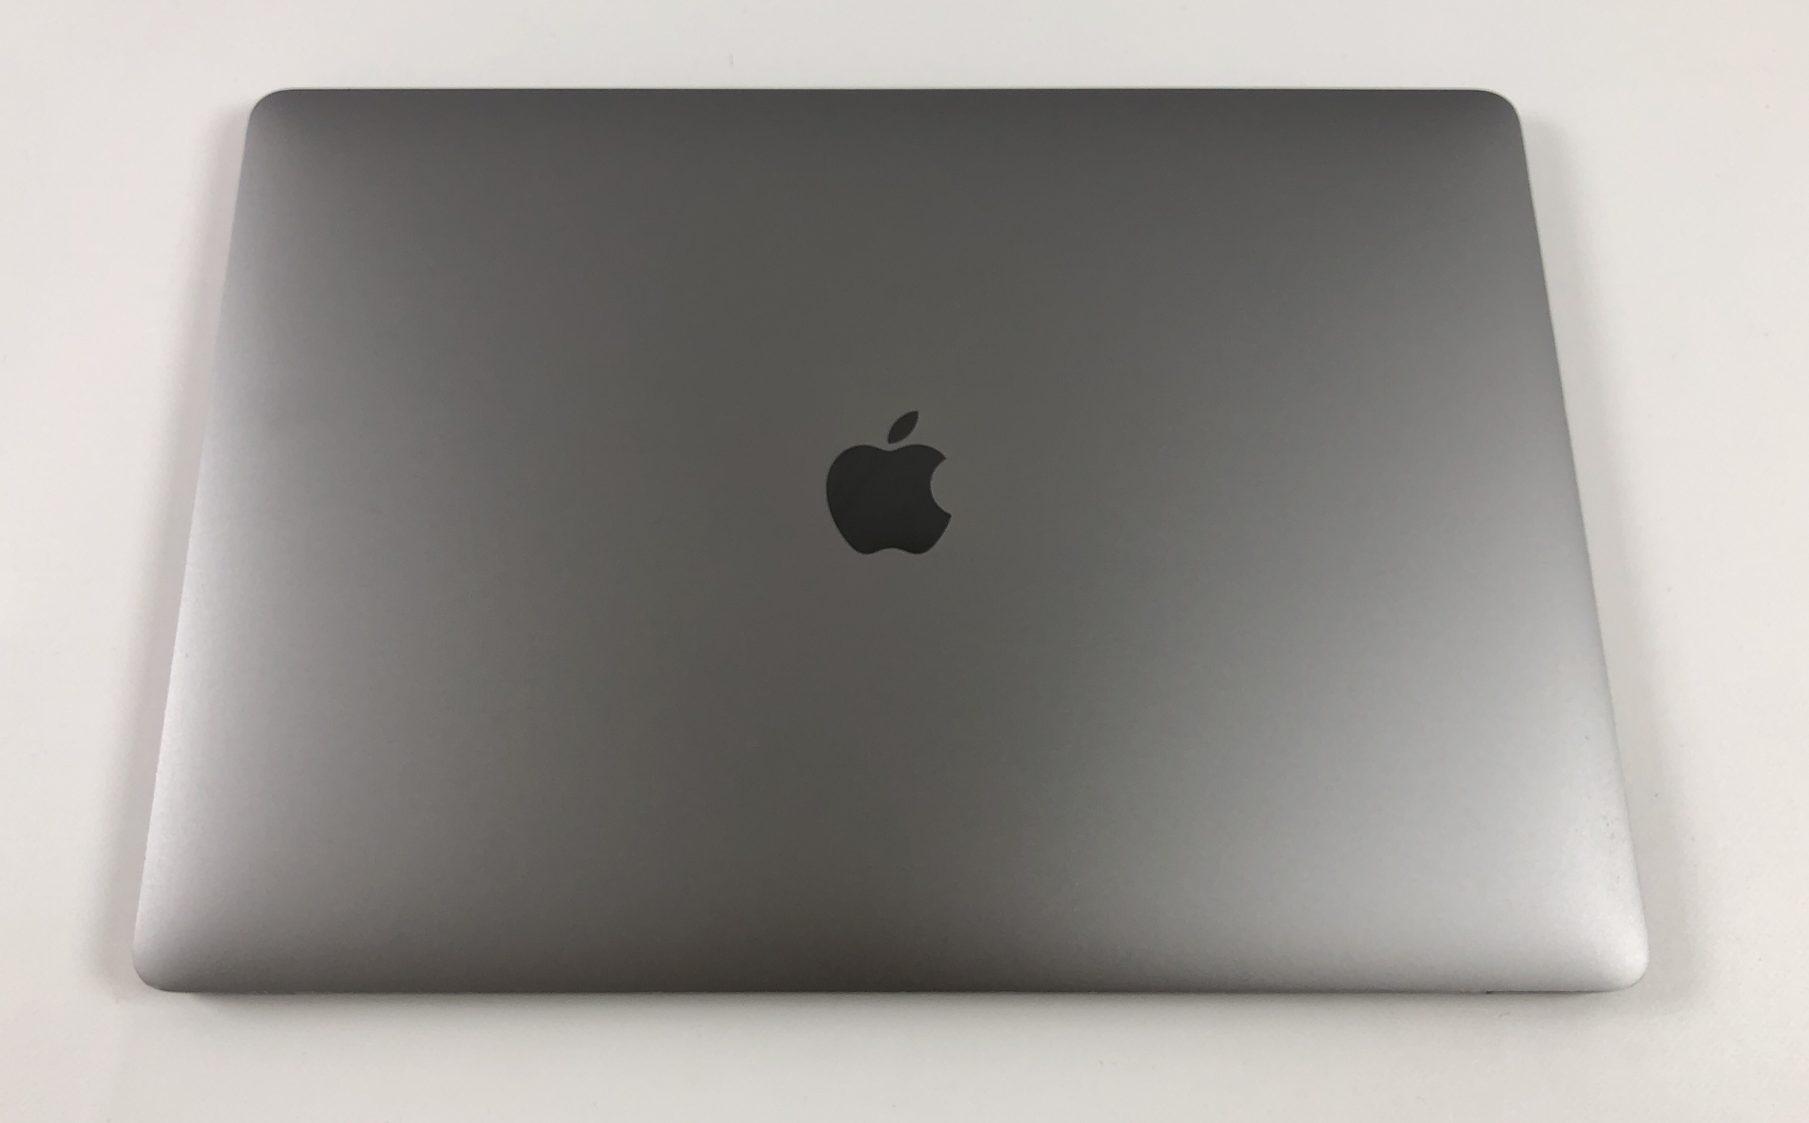 "MacBook Pro 15"" Touch Bar Mid 2017 (Intel Quad-Core i7 2.8 GHz 16 GB RAM 256 GB SSD), Space Gray, Intel Quad-Core i7 2.8 GHz, 16 GB RAM, 256 GB SSD, image 2"